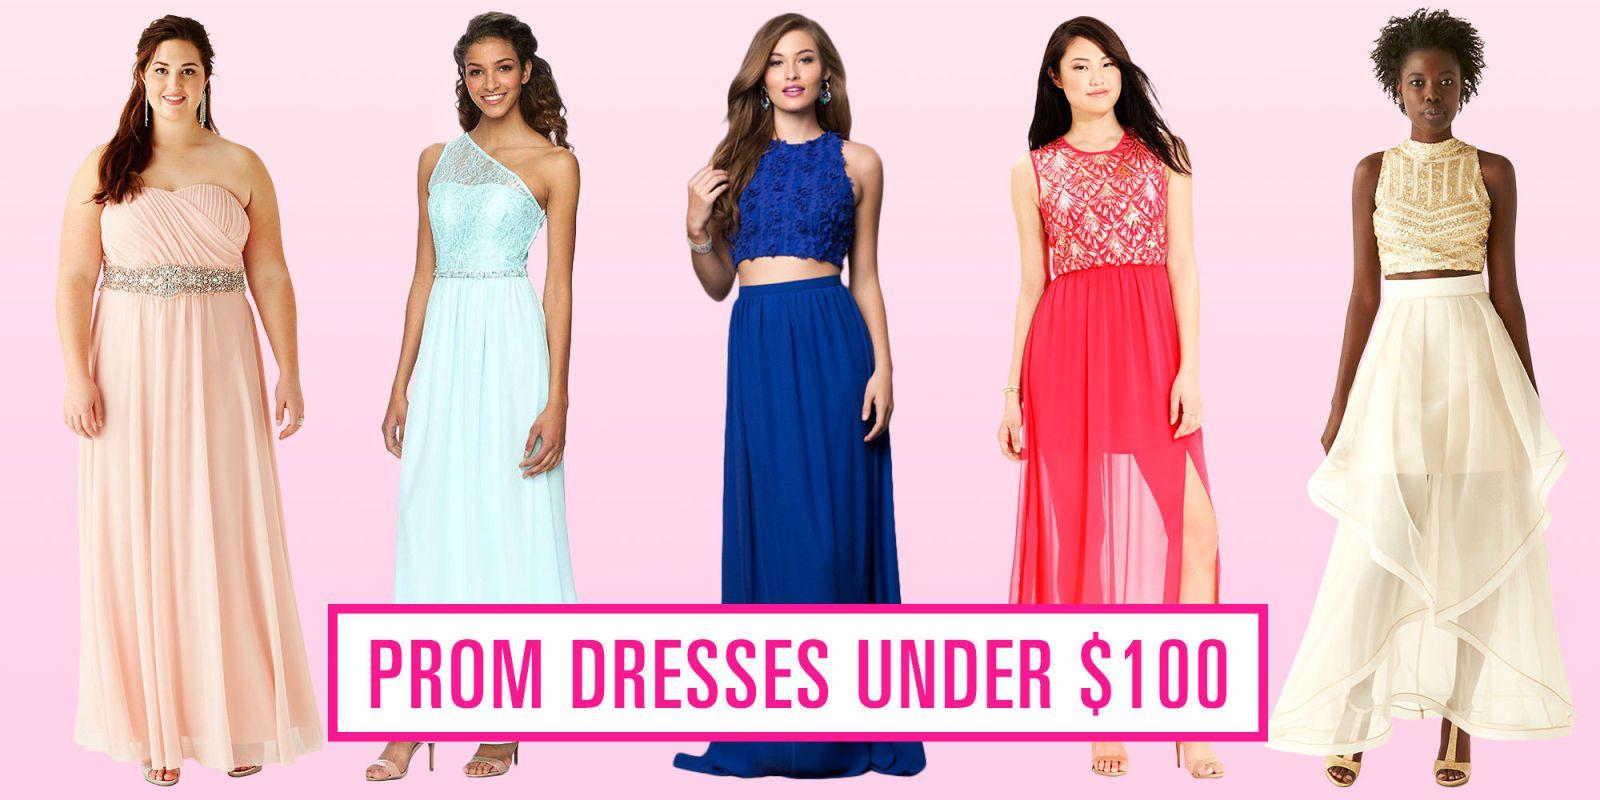 18 Gorgeous Prom Dresses Under $100   Gorgeous prom dresses, Prom ...